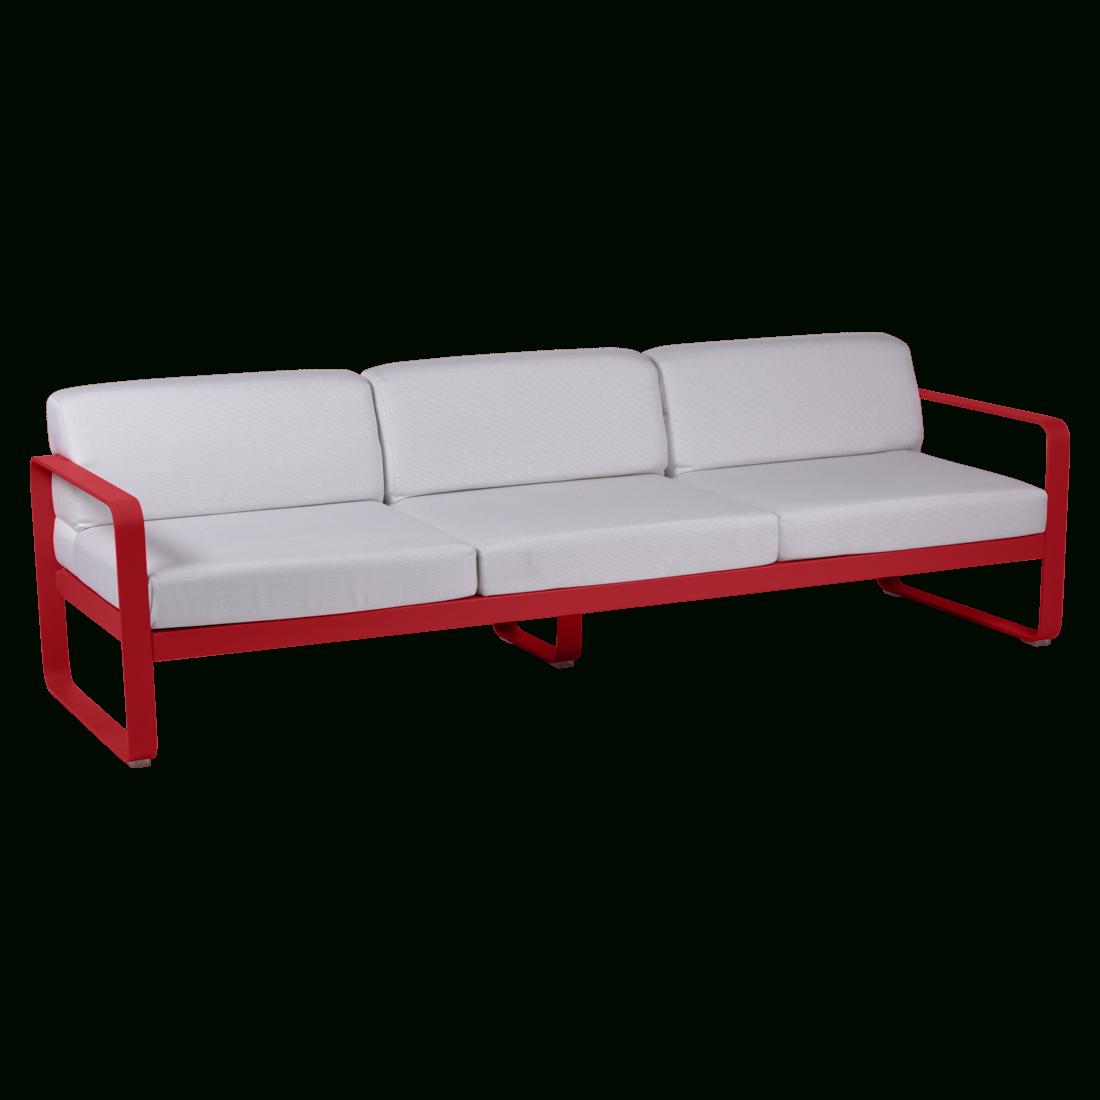 Bellevie 3-Seater Sofa With Off-White Cushions, Garden Sofa ... concernant Salon De Jardin Rouge